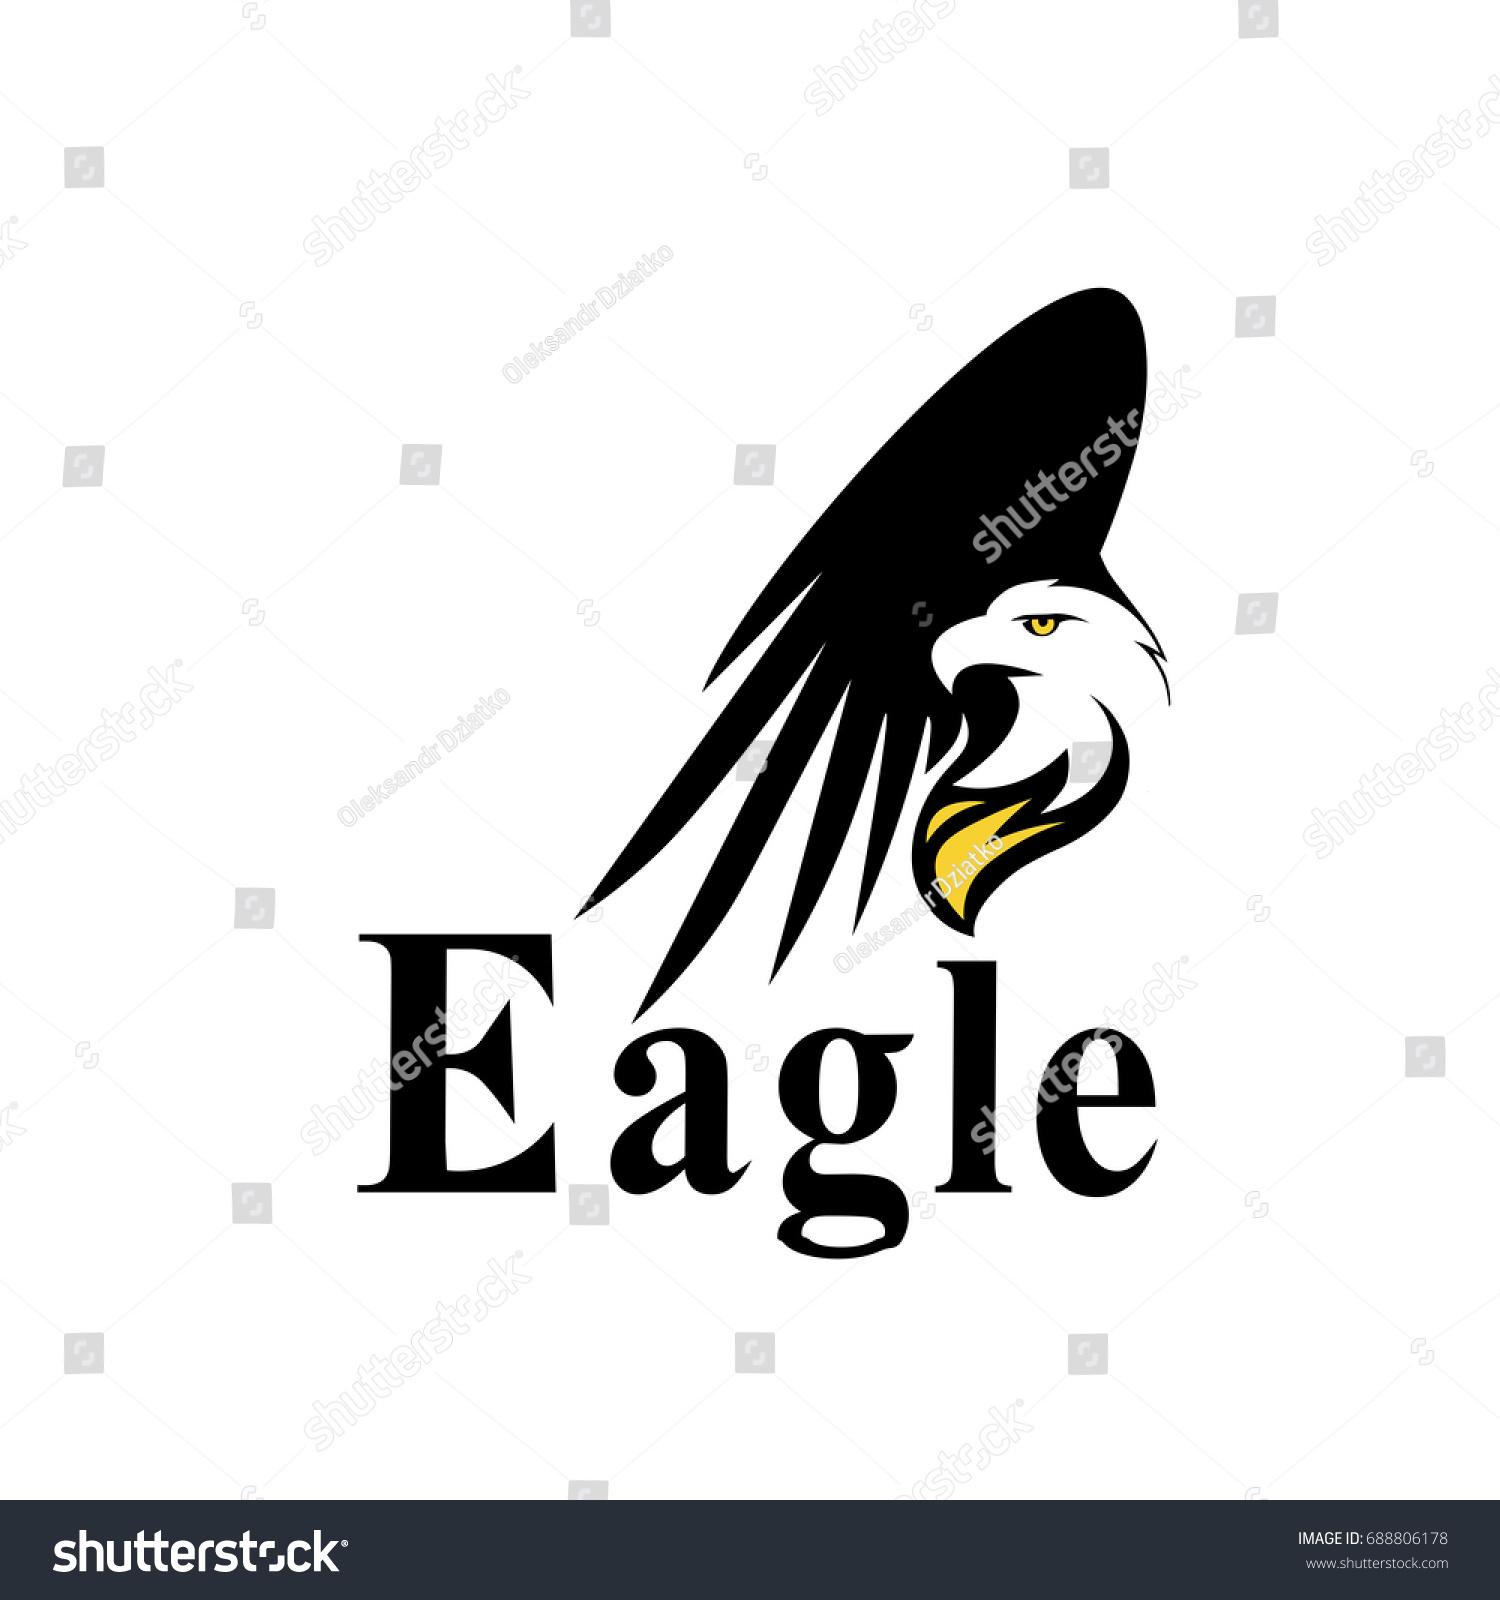 Fire eagle icon symbol eagle hawk stock vector 688806178 fire eagle icon symbol of eagle hawk predator for sport team mascot company badge biocorpaavc Images